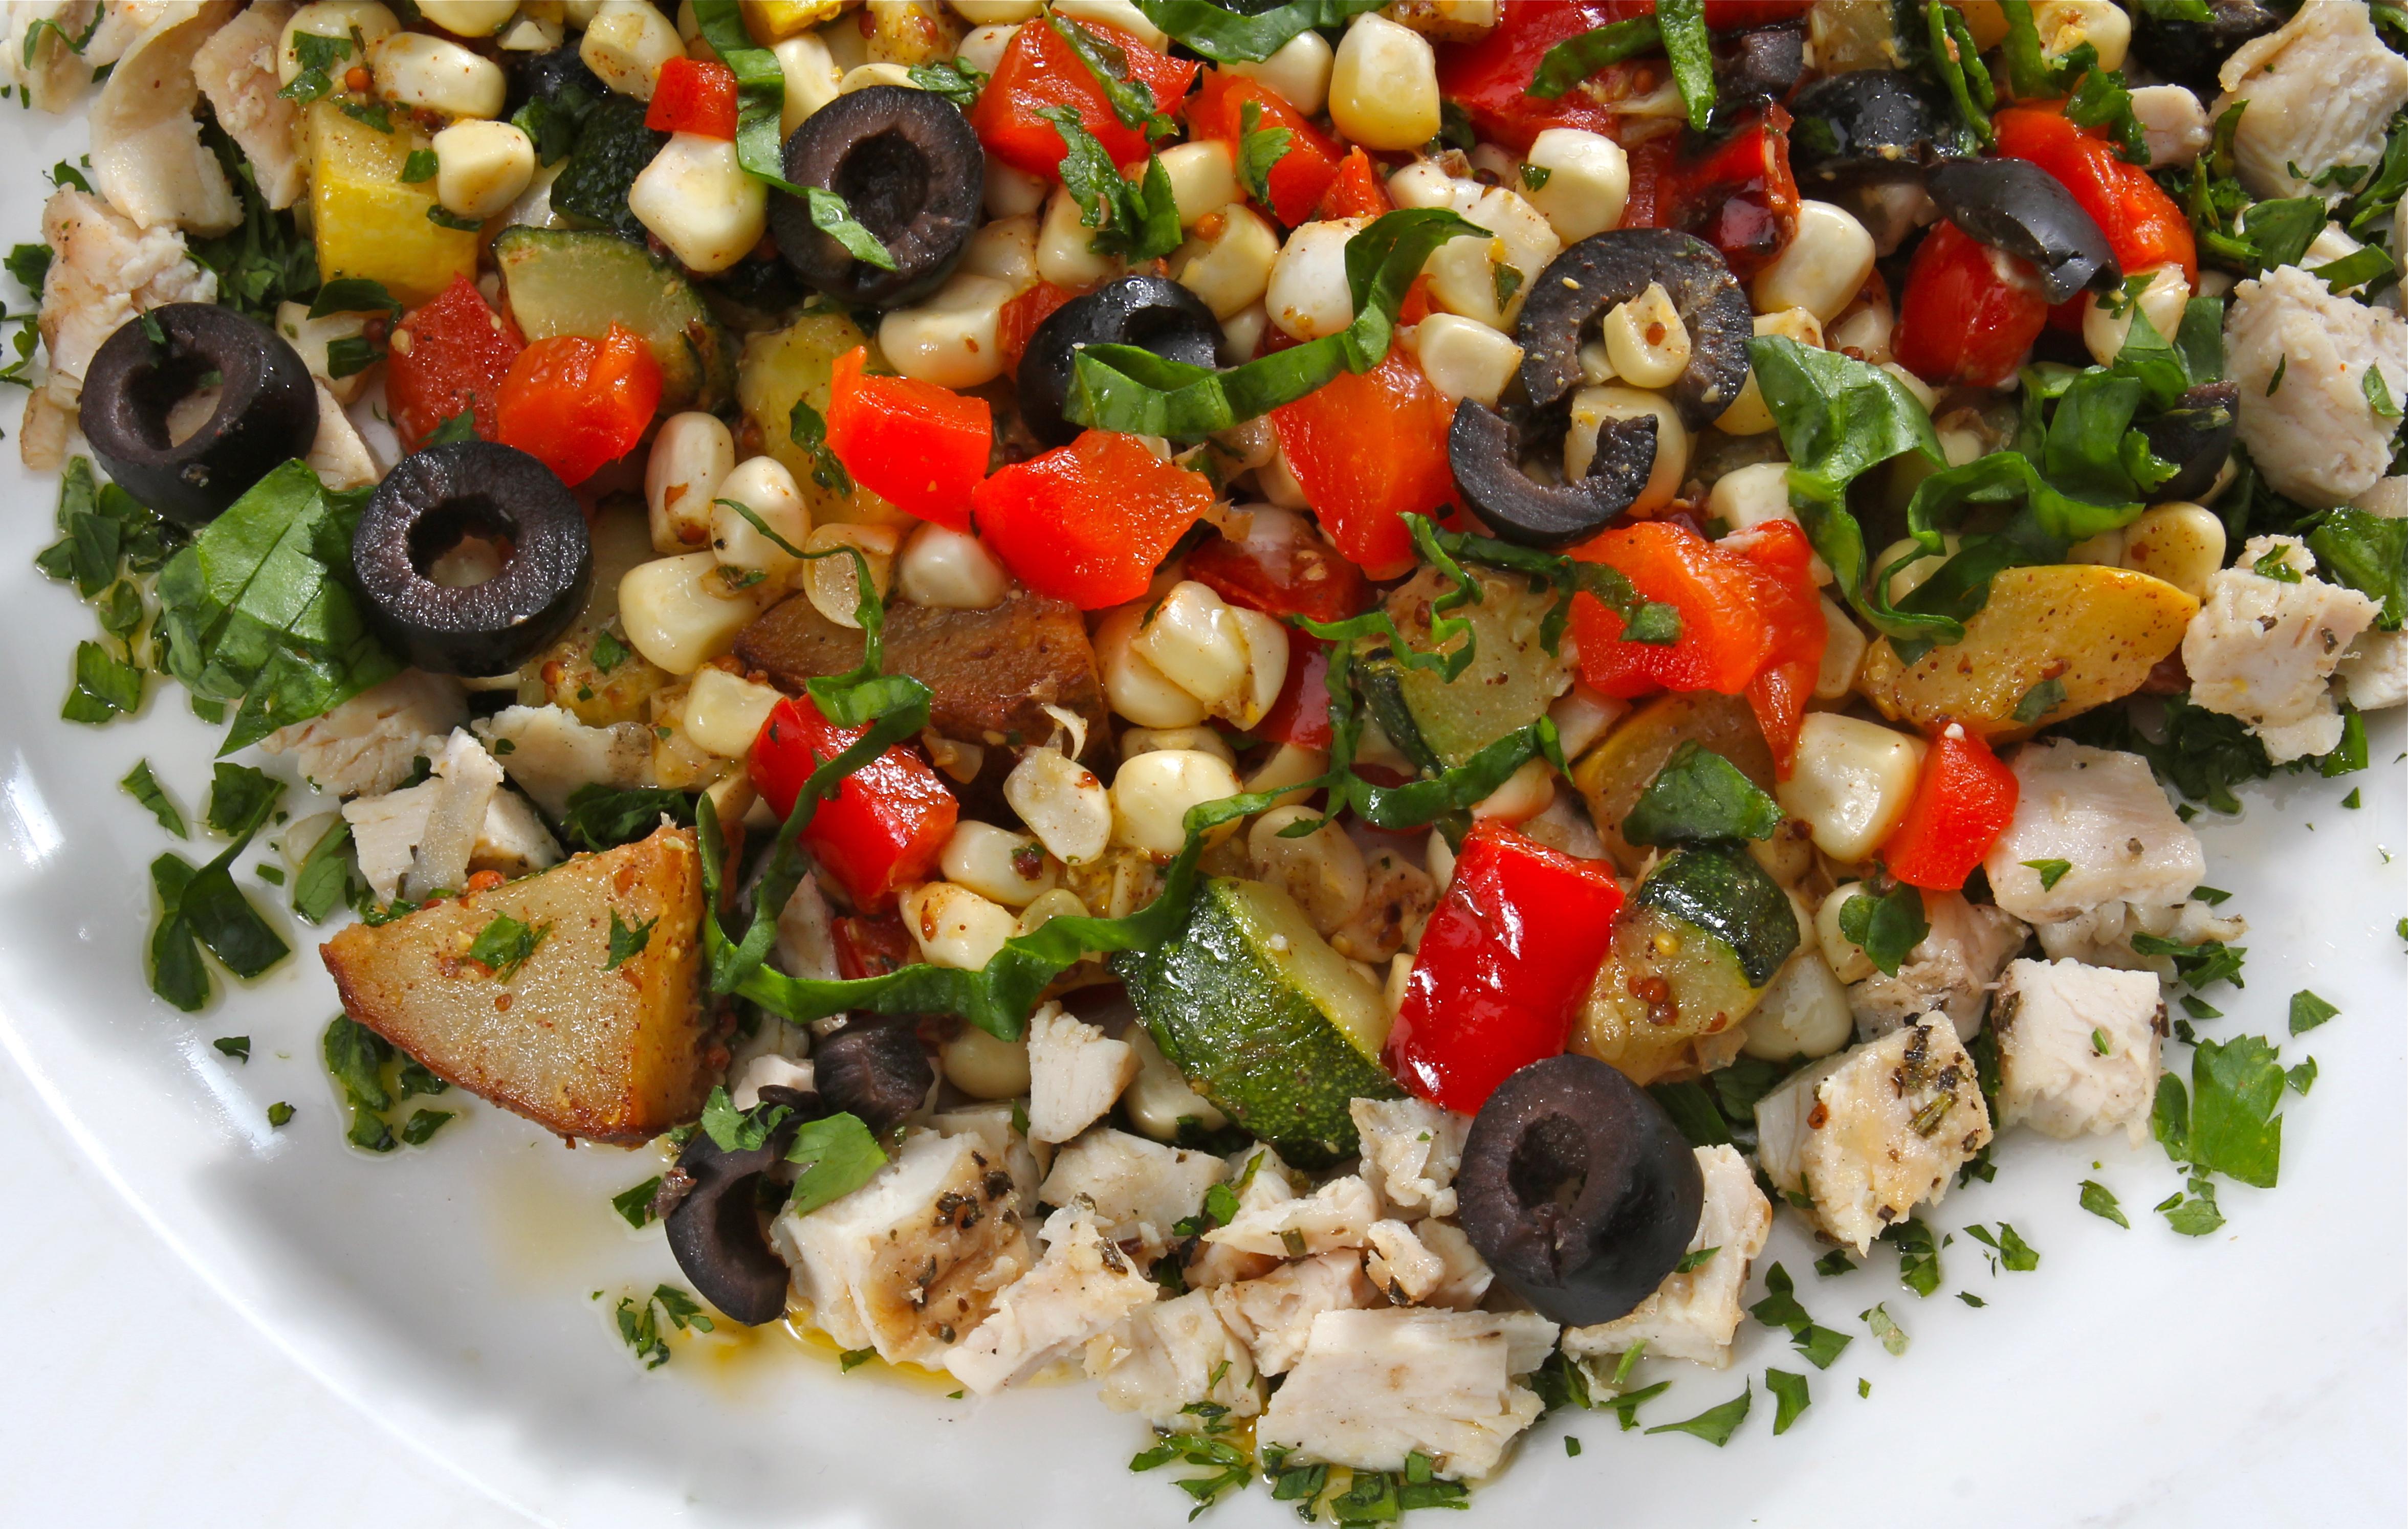 Adele's Corn Salad